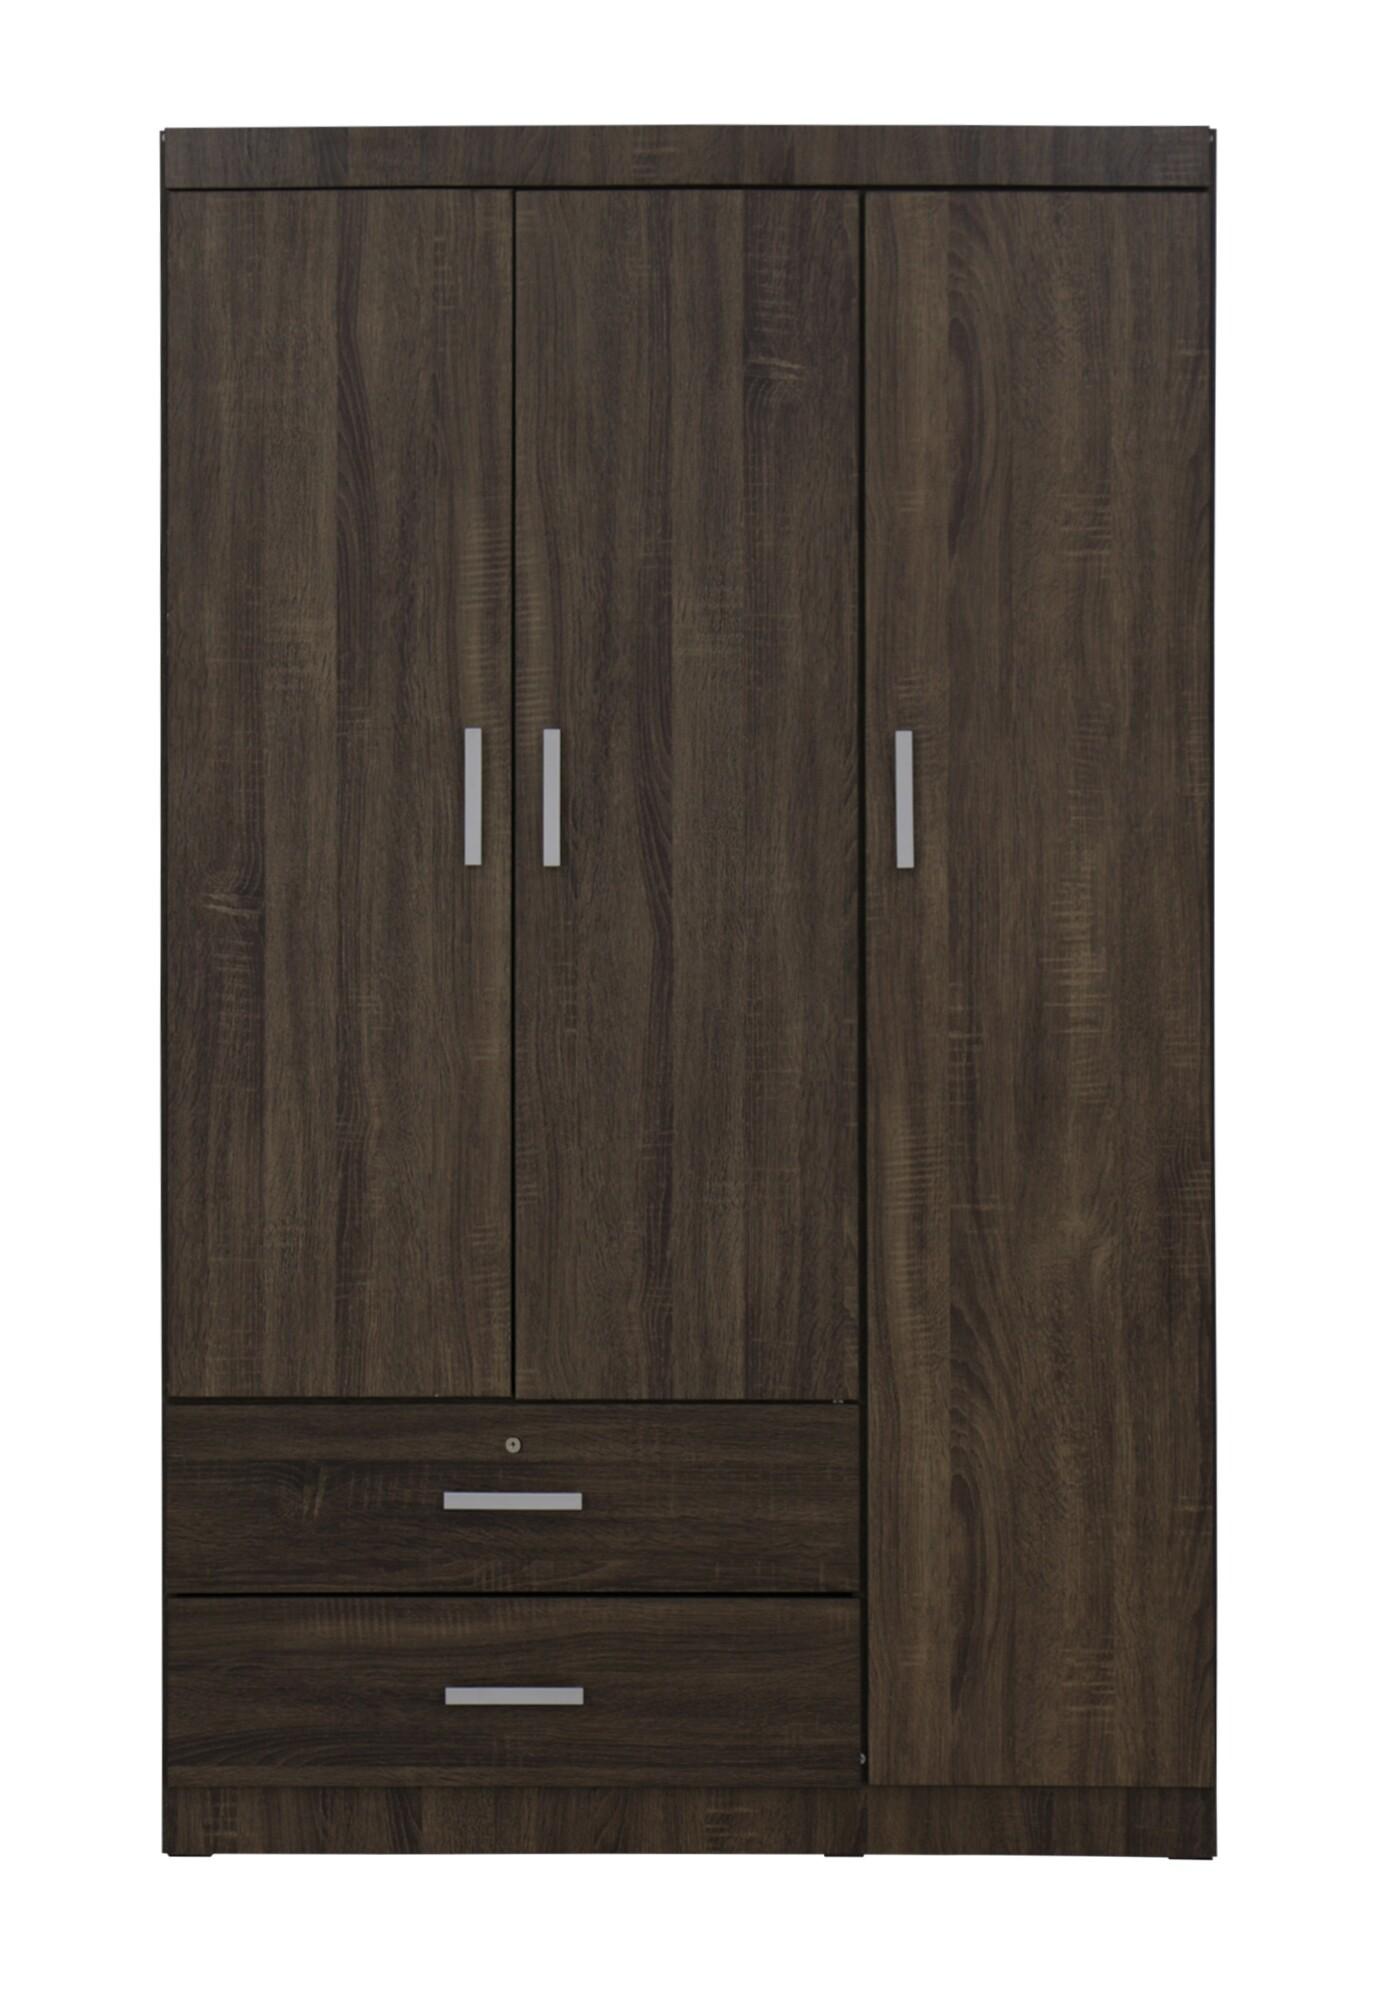 Charmant Elifel 3 Door Wardrobe In Walnut